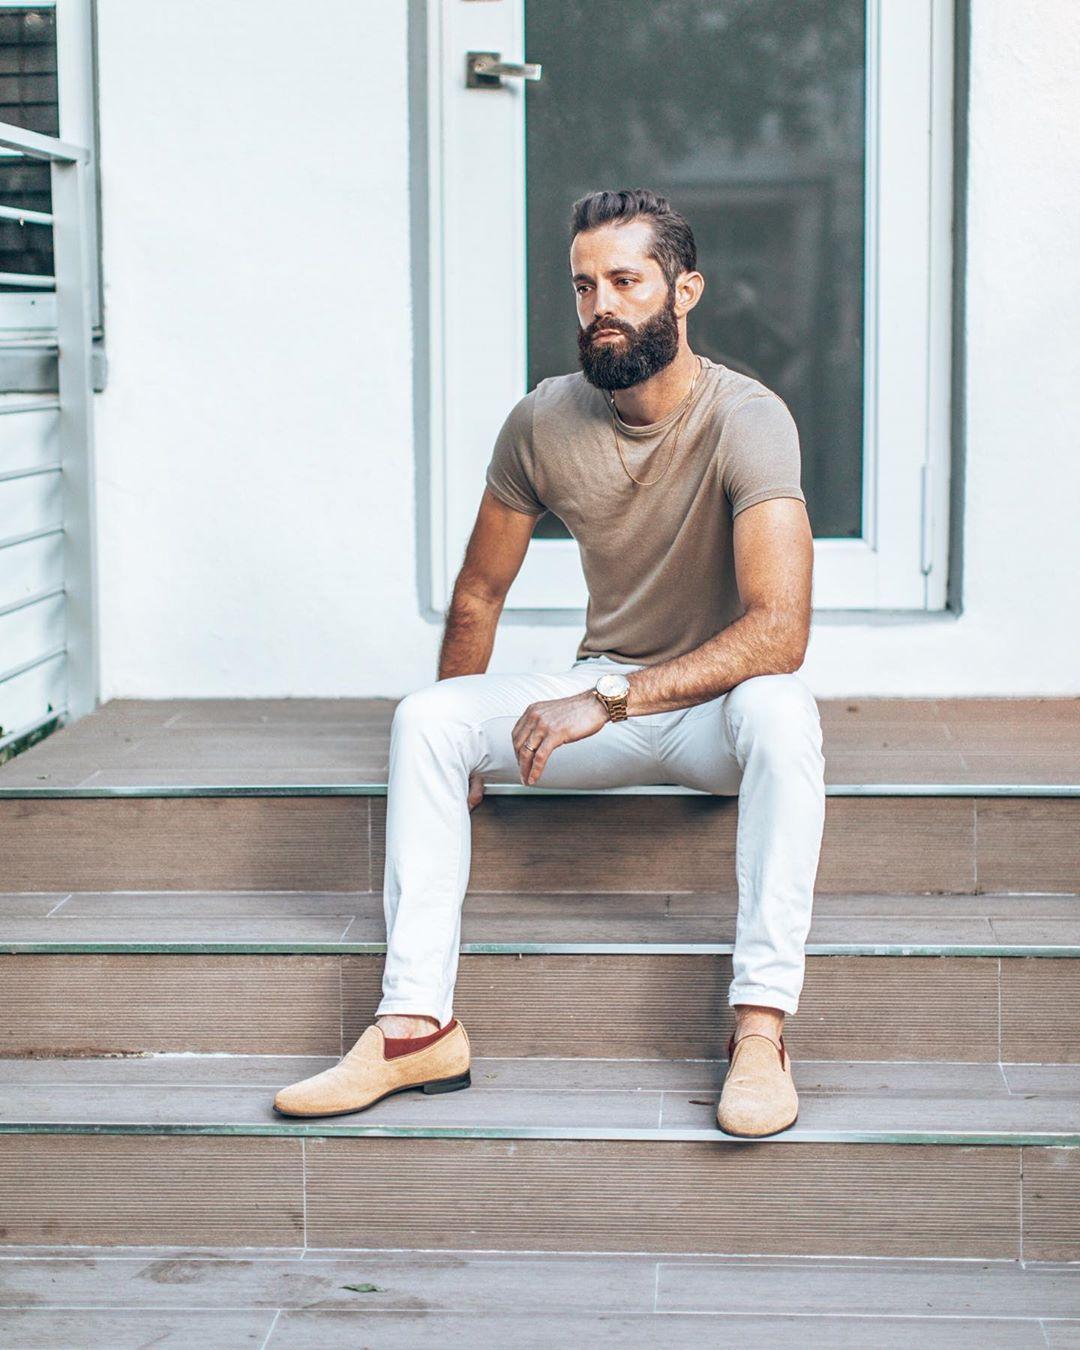 Michael Checkers Miami sitting model poses